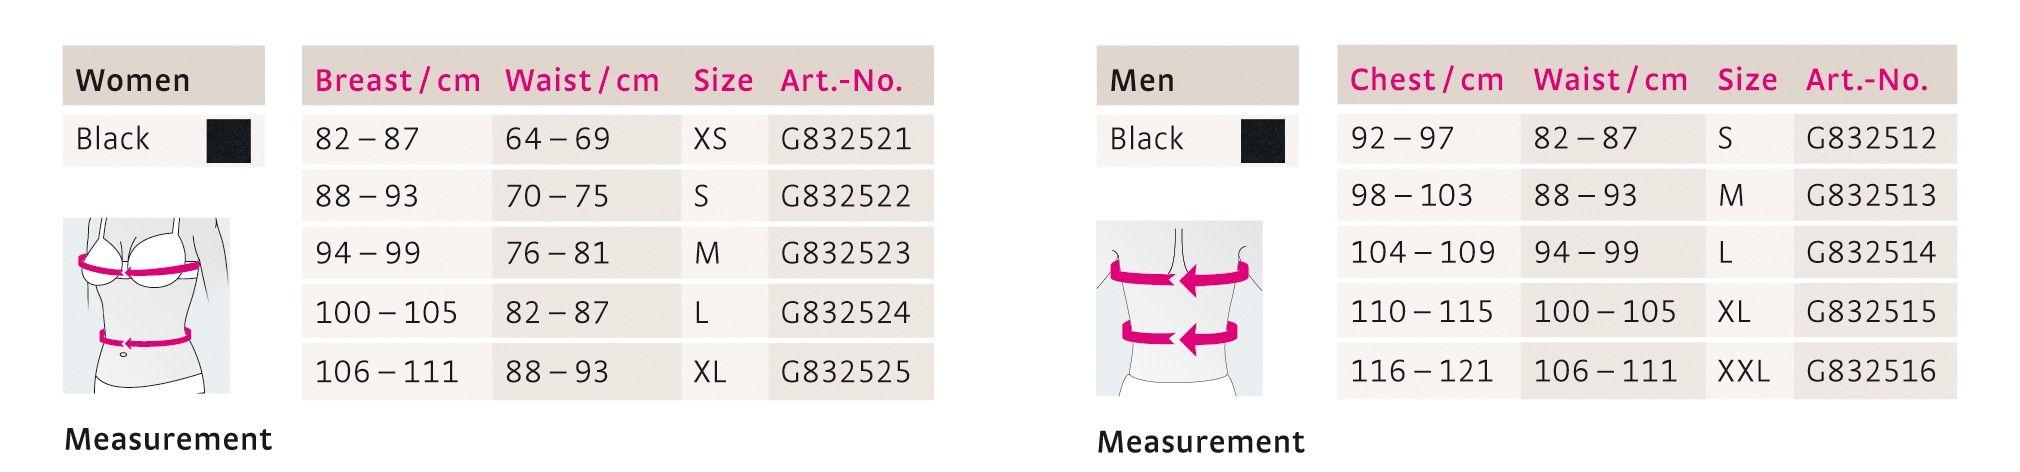 medi-posture-plus-comfort-size-chart-m-221314